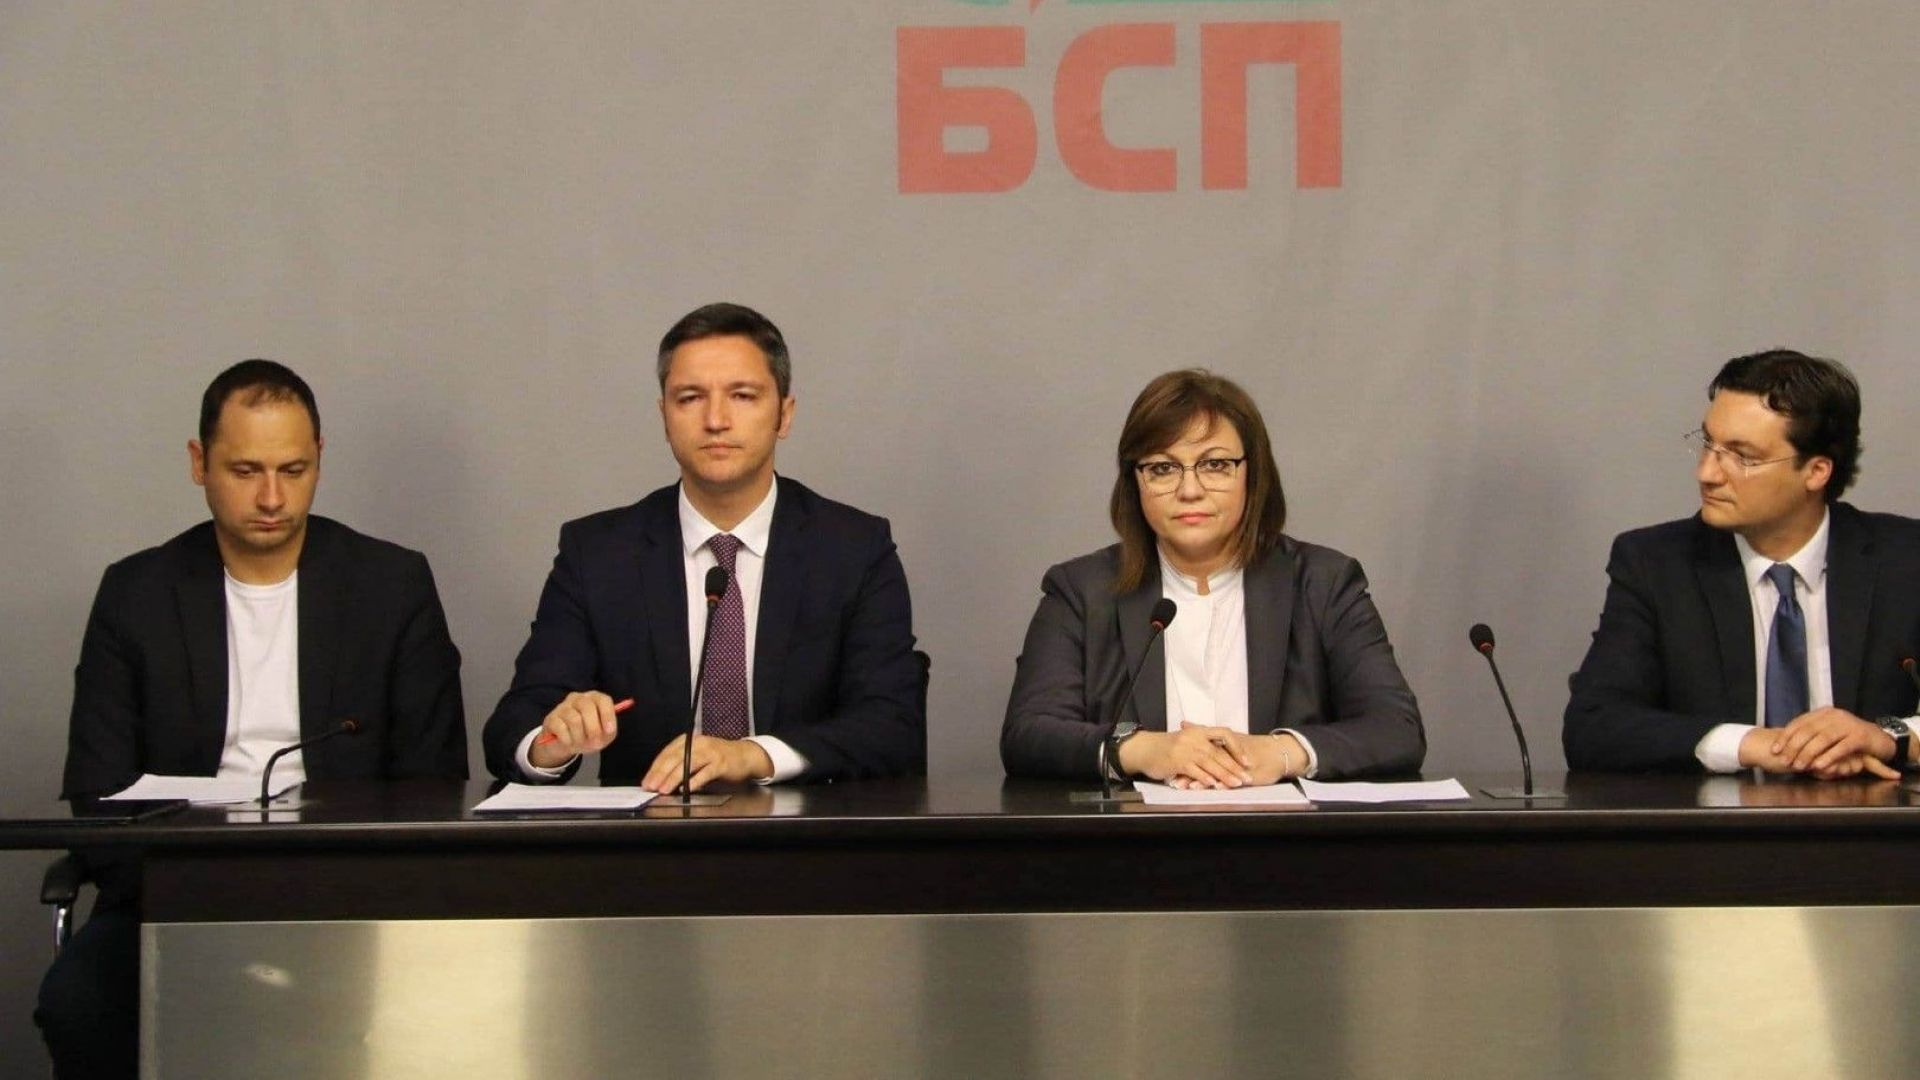 Корнелия Нинова: Изчерпано управление, делегитимиран парламент